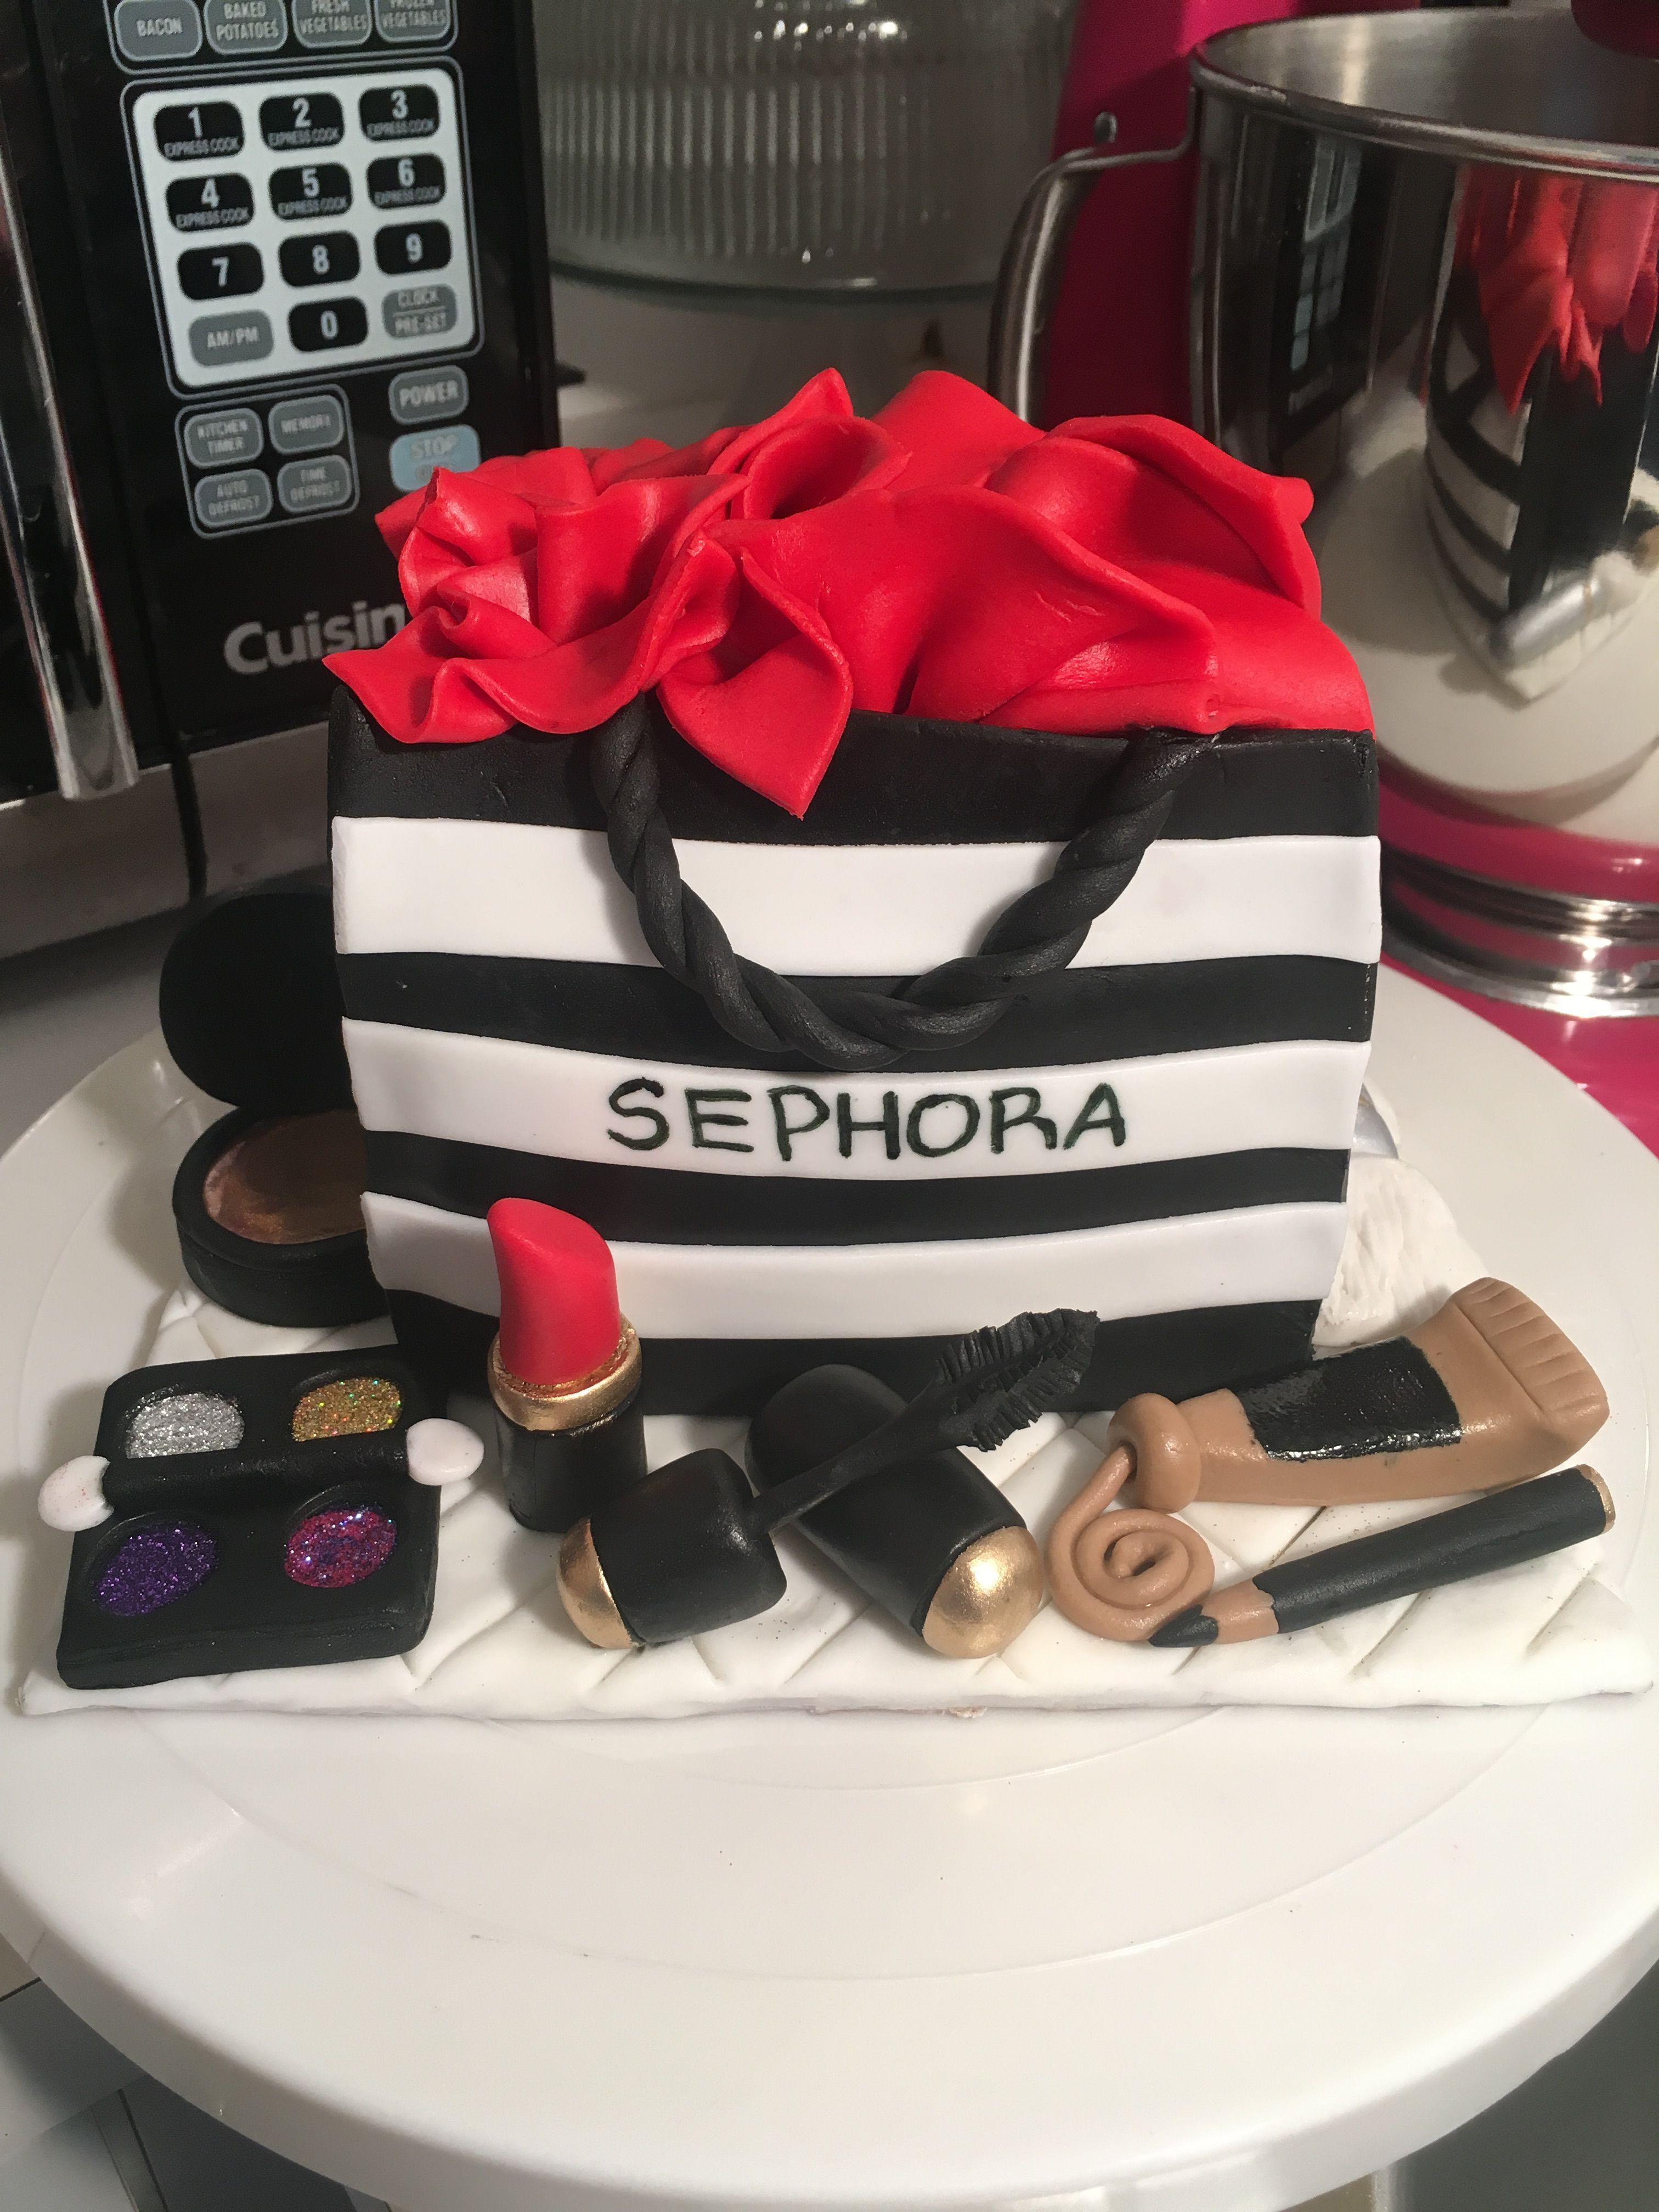 Sephora Bag Birthday Cake Sweet 16 33rd 21st Cakes